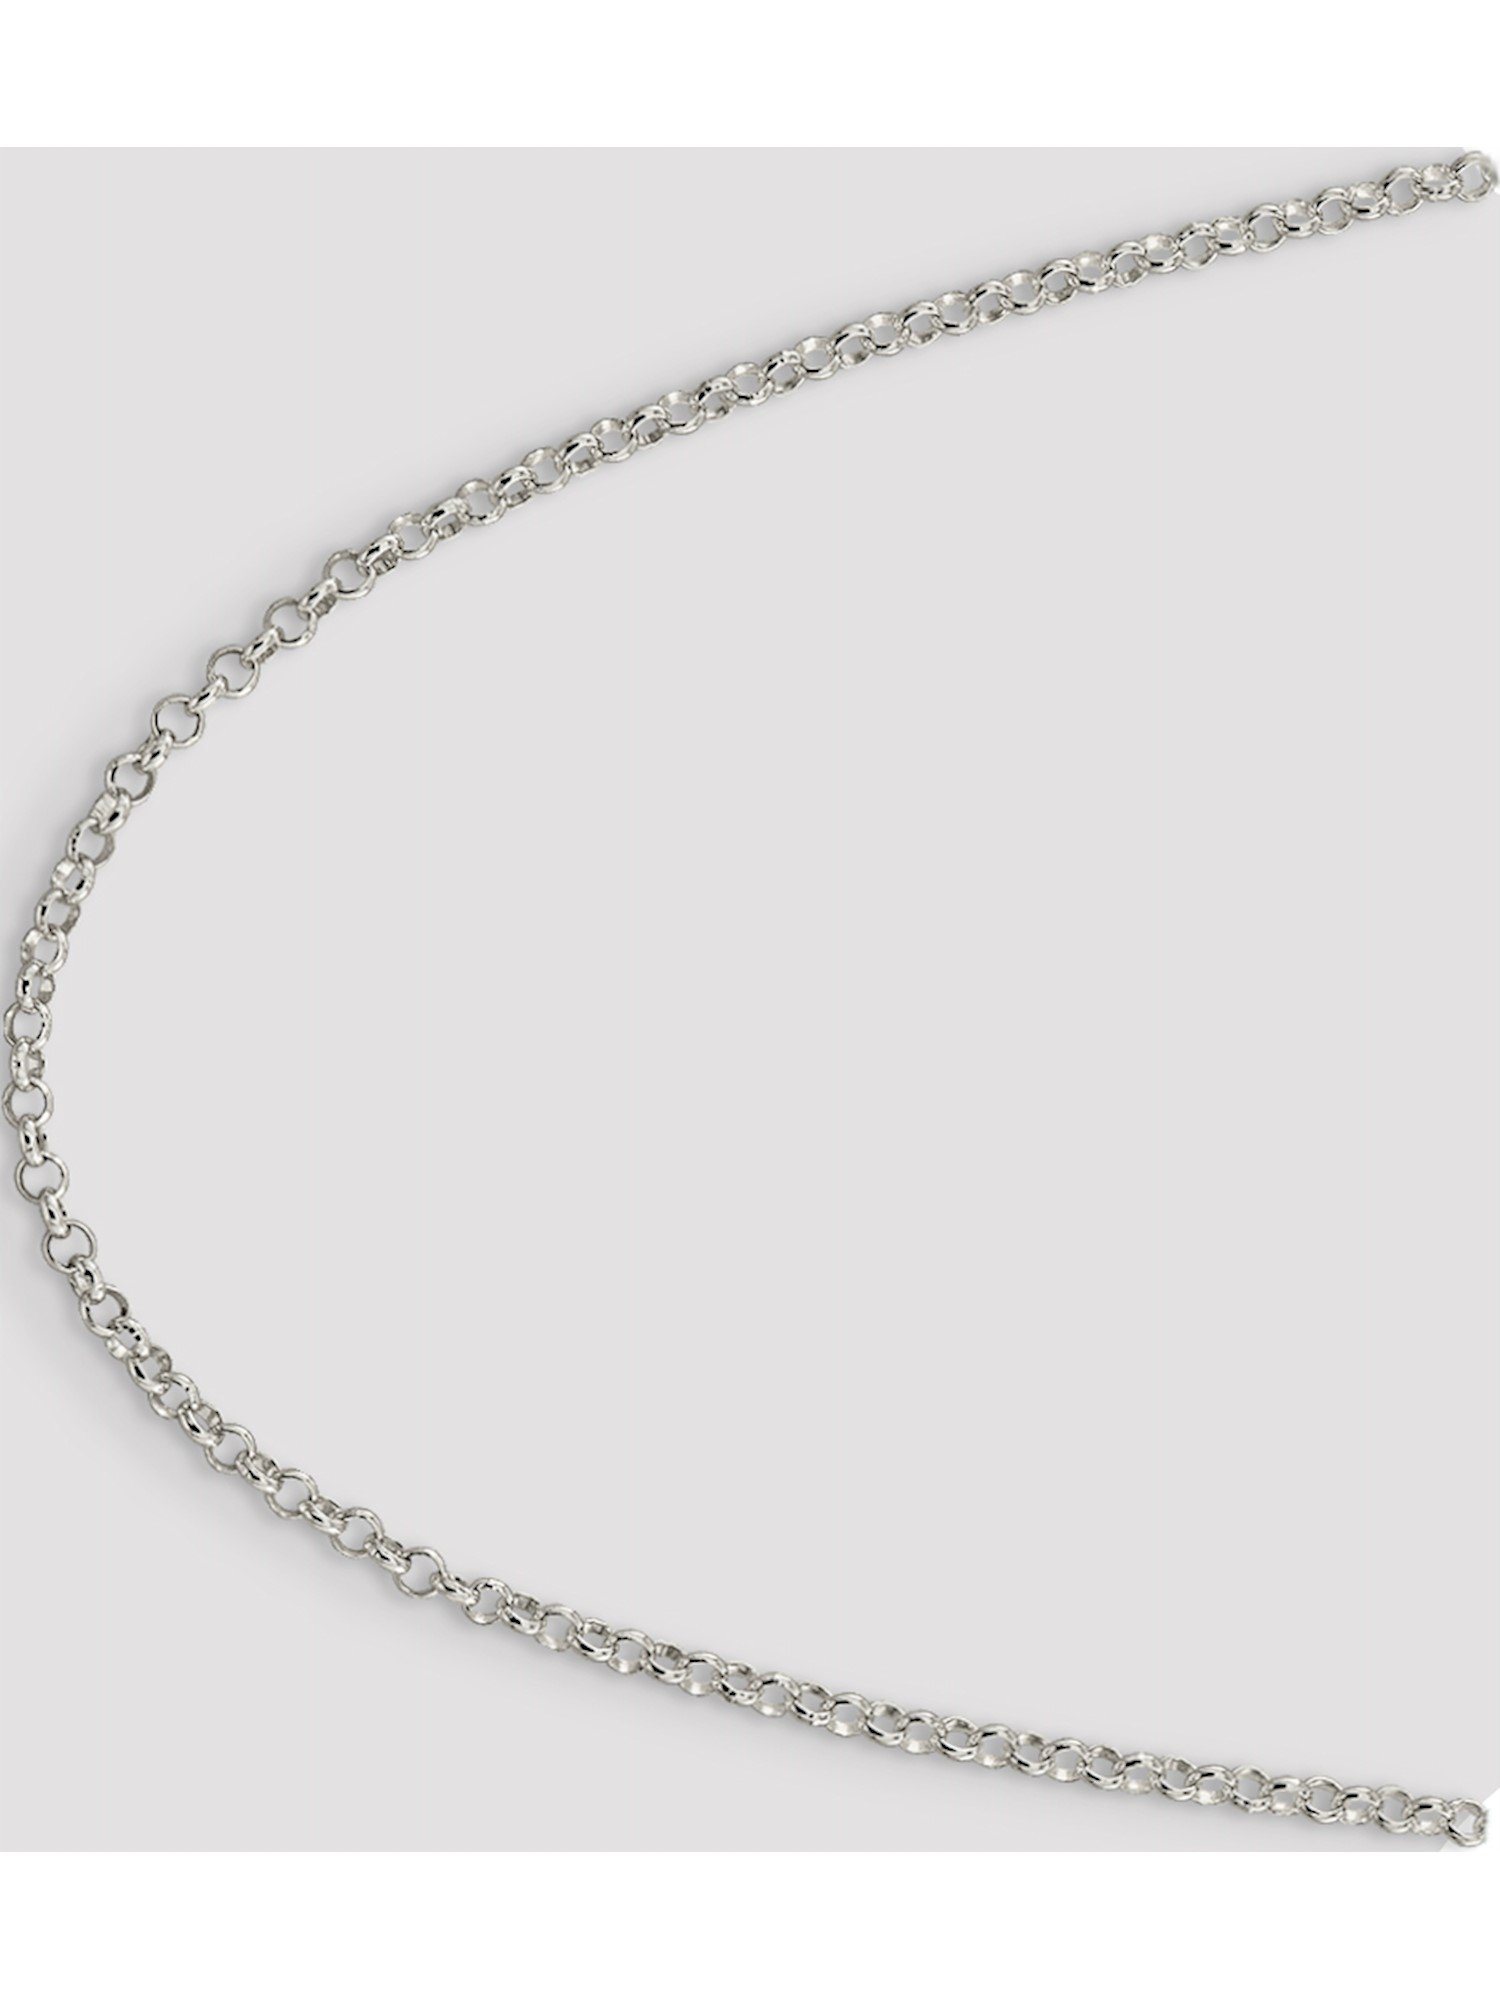 10k Cubic Zirconia Toe Ring CoutureJewelers QG-10C1156-CJ